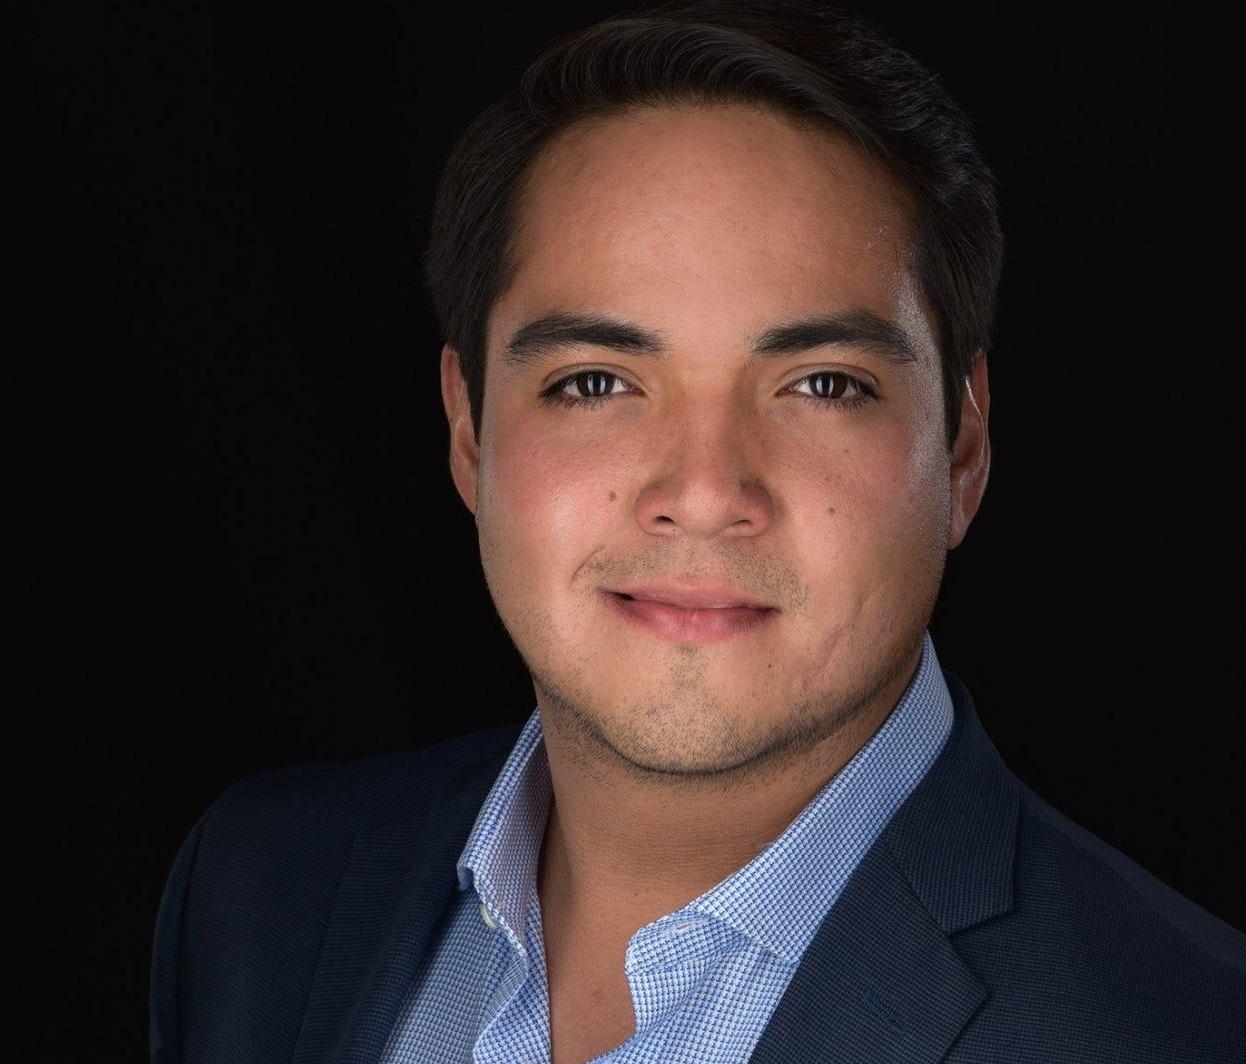 Jorge Espino